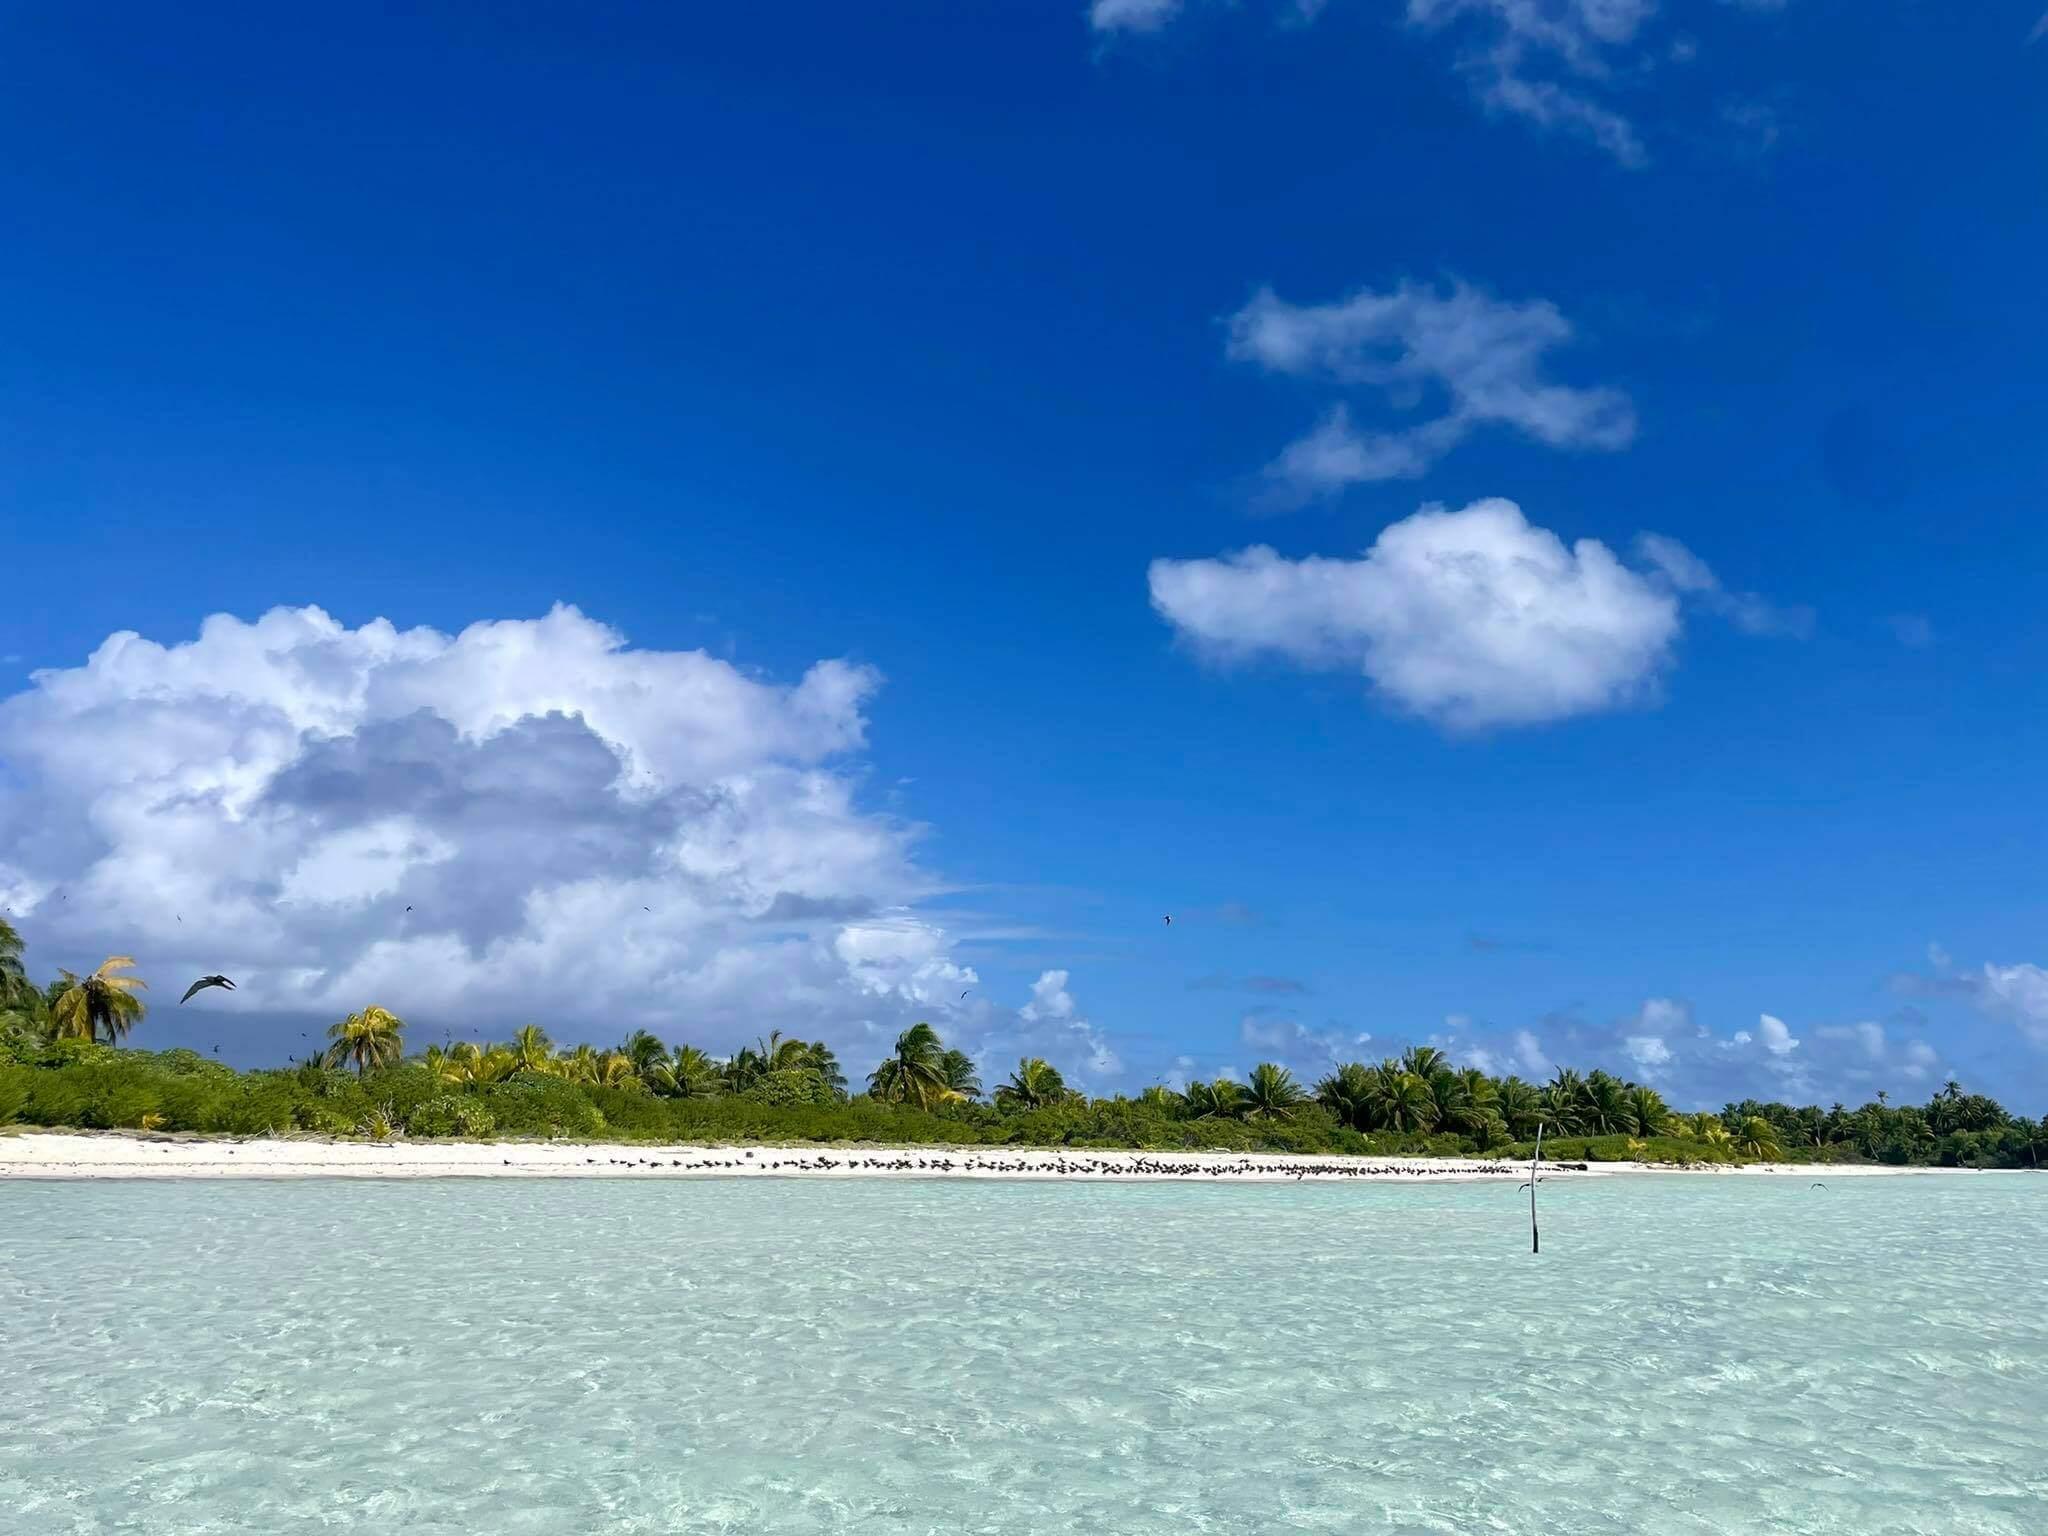 http://tahitivoileetlagon.com/wp-content/uploads/2021/07/oiseaux-motu-TETIAROA.jpg